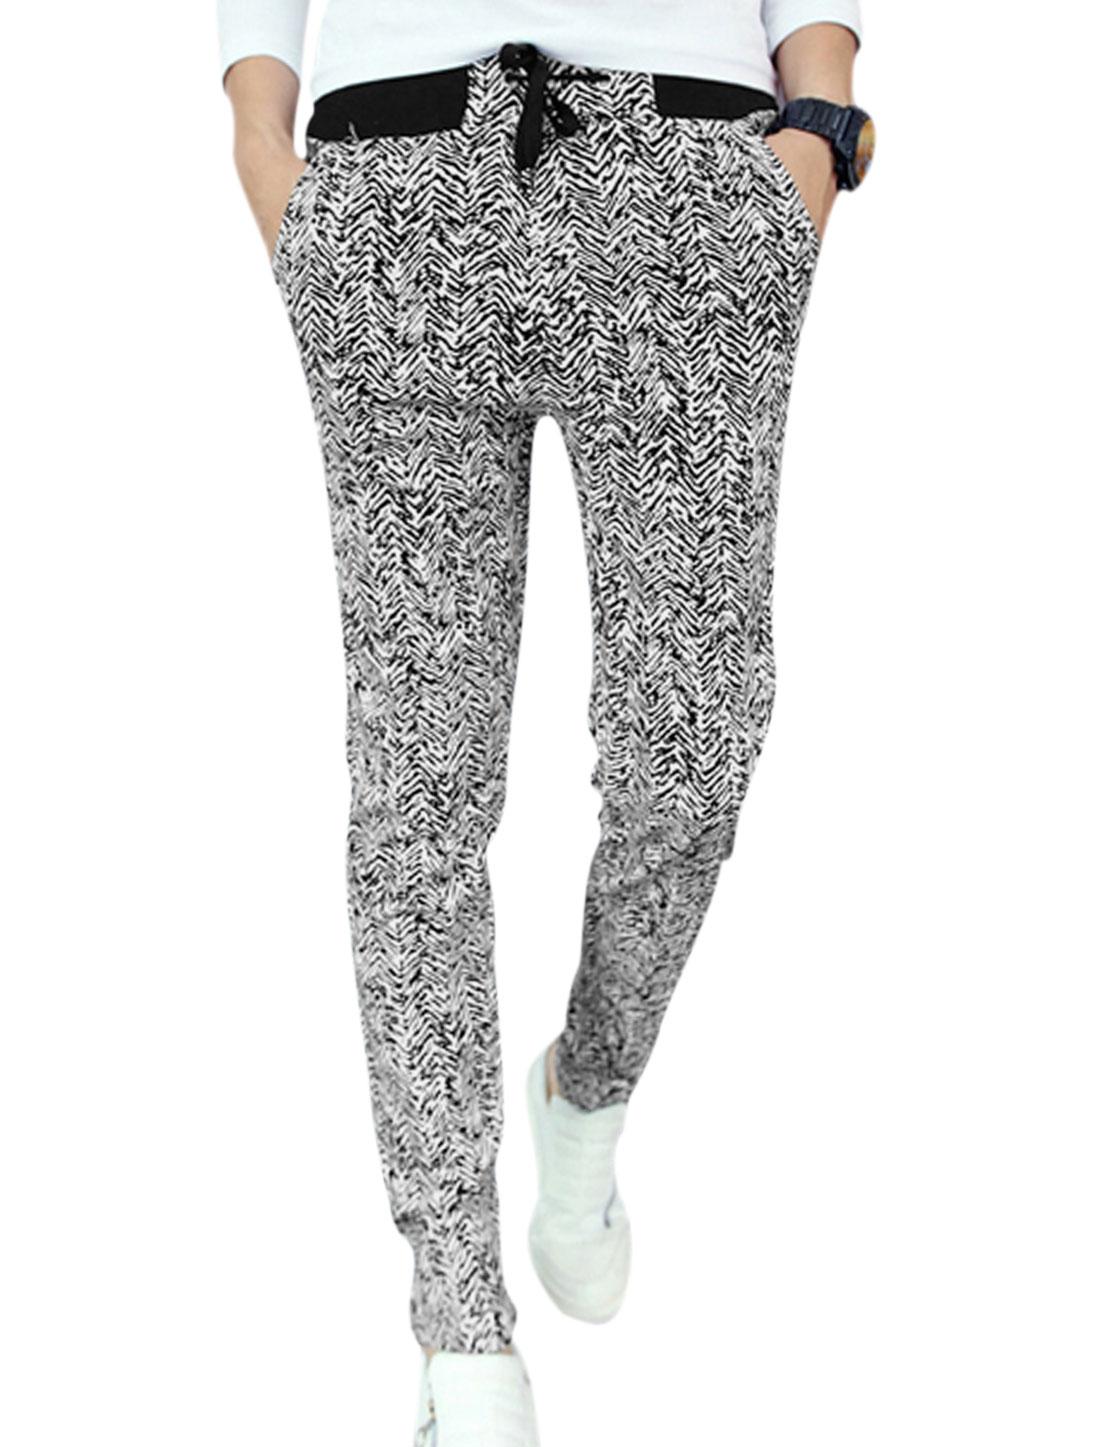 Men Hip Pockets Decor All Over Zigzag Print Leisure Pants Black White W30